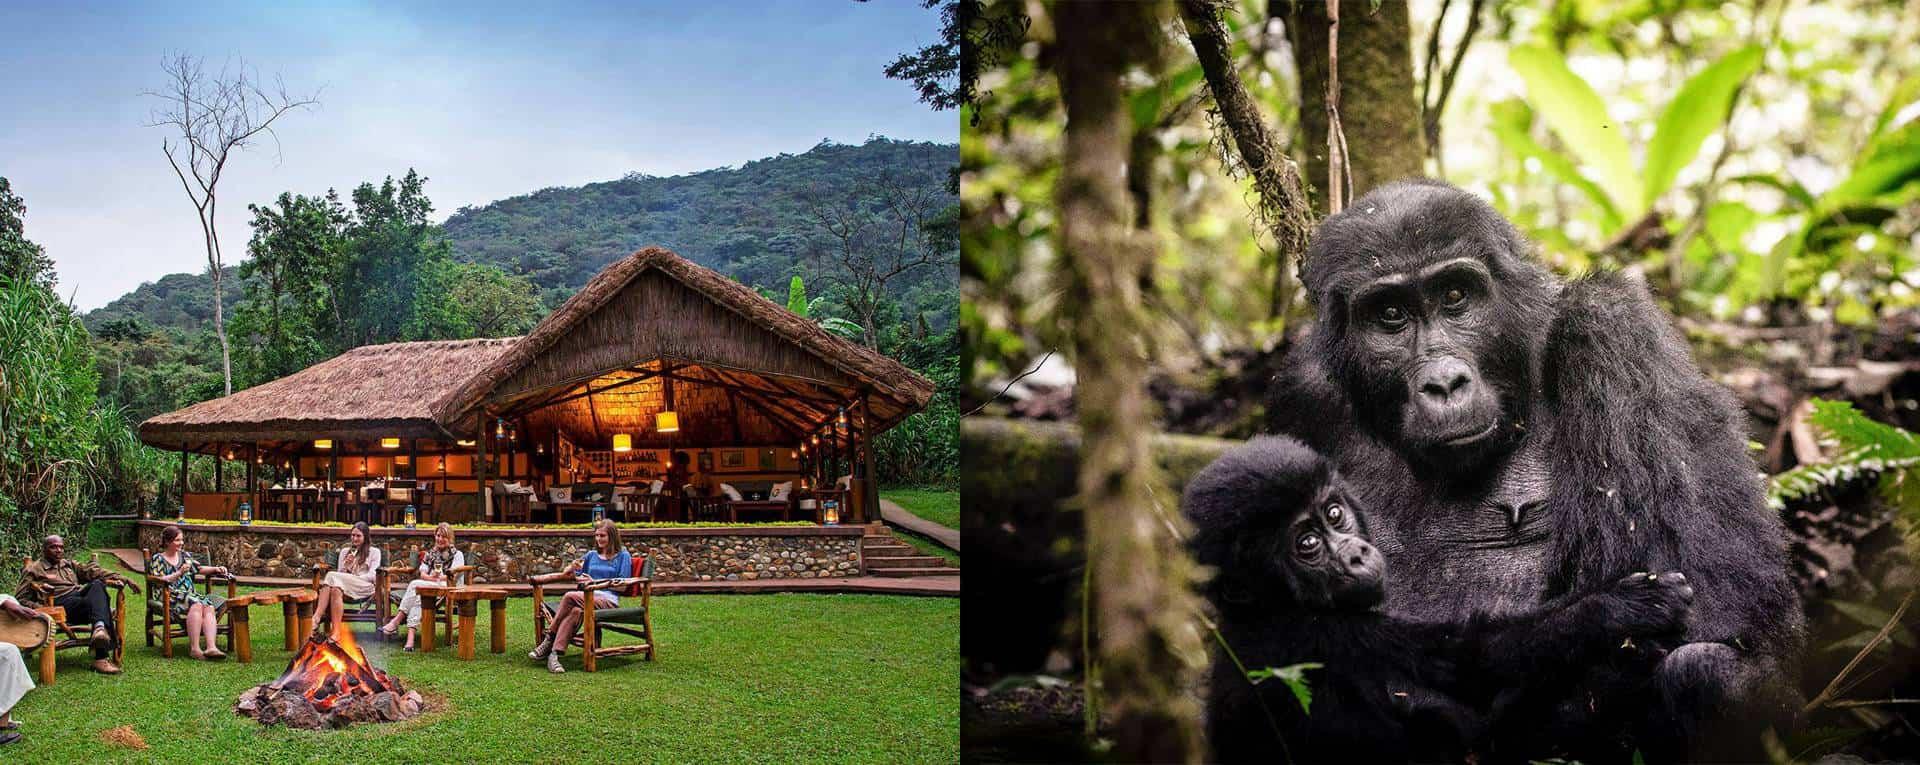 Luxury Safaris Trip Planning Guide For Uganda